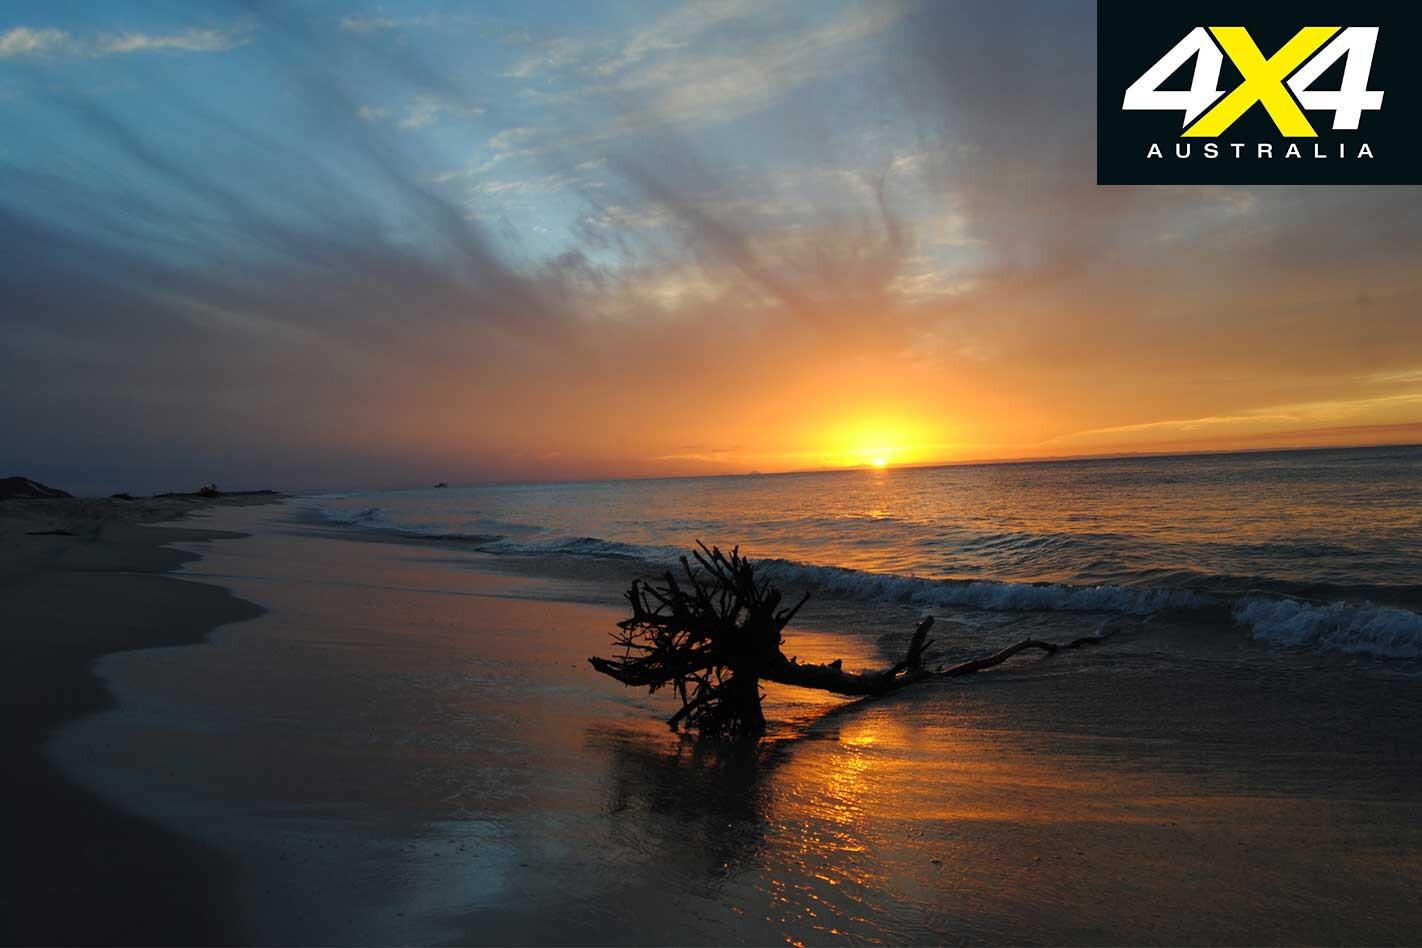 Cel Fi GO Repeater Remote Moreton Island Beach Sunset Jpg